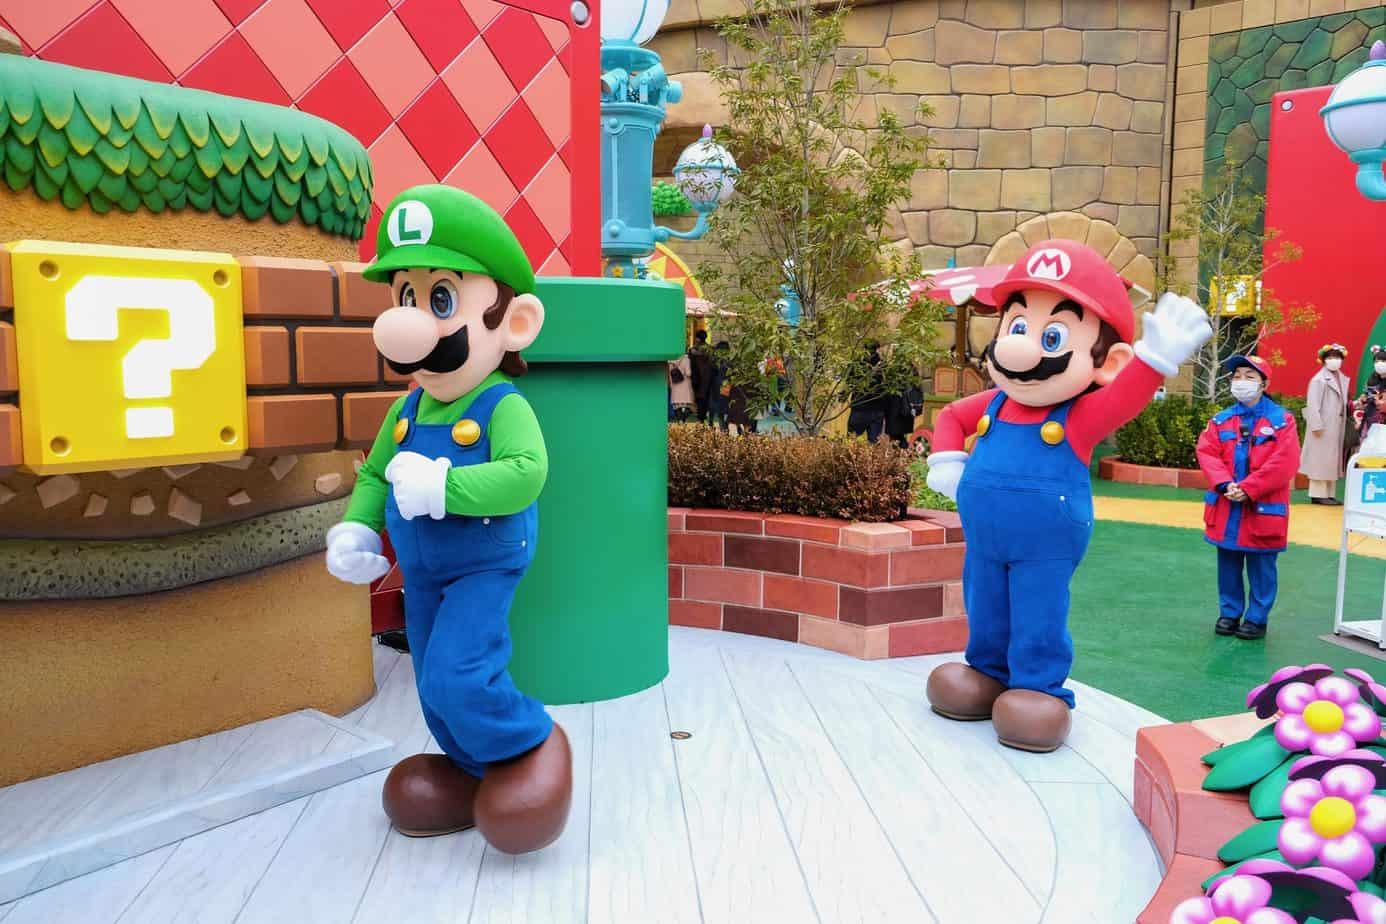 Mario and Luigi Character Greeting